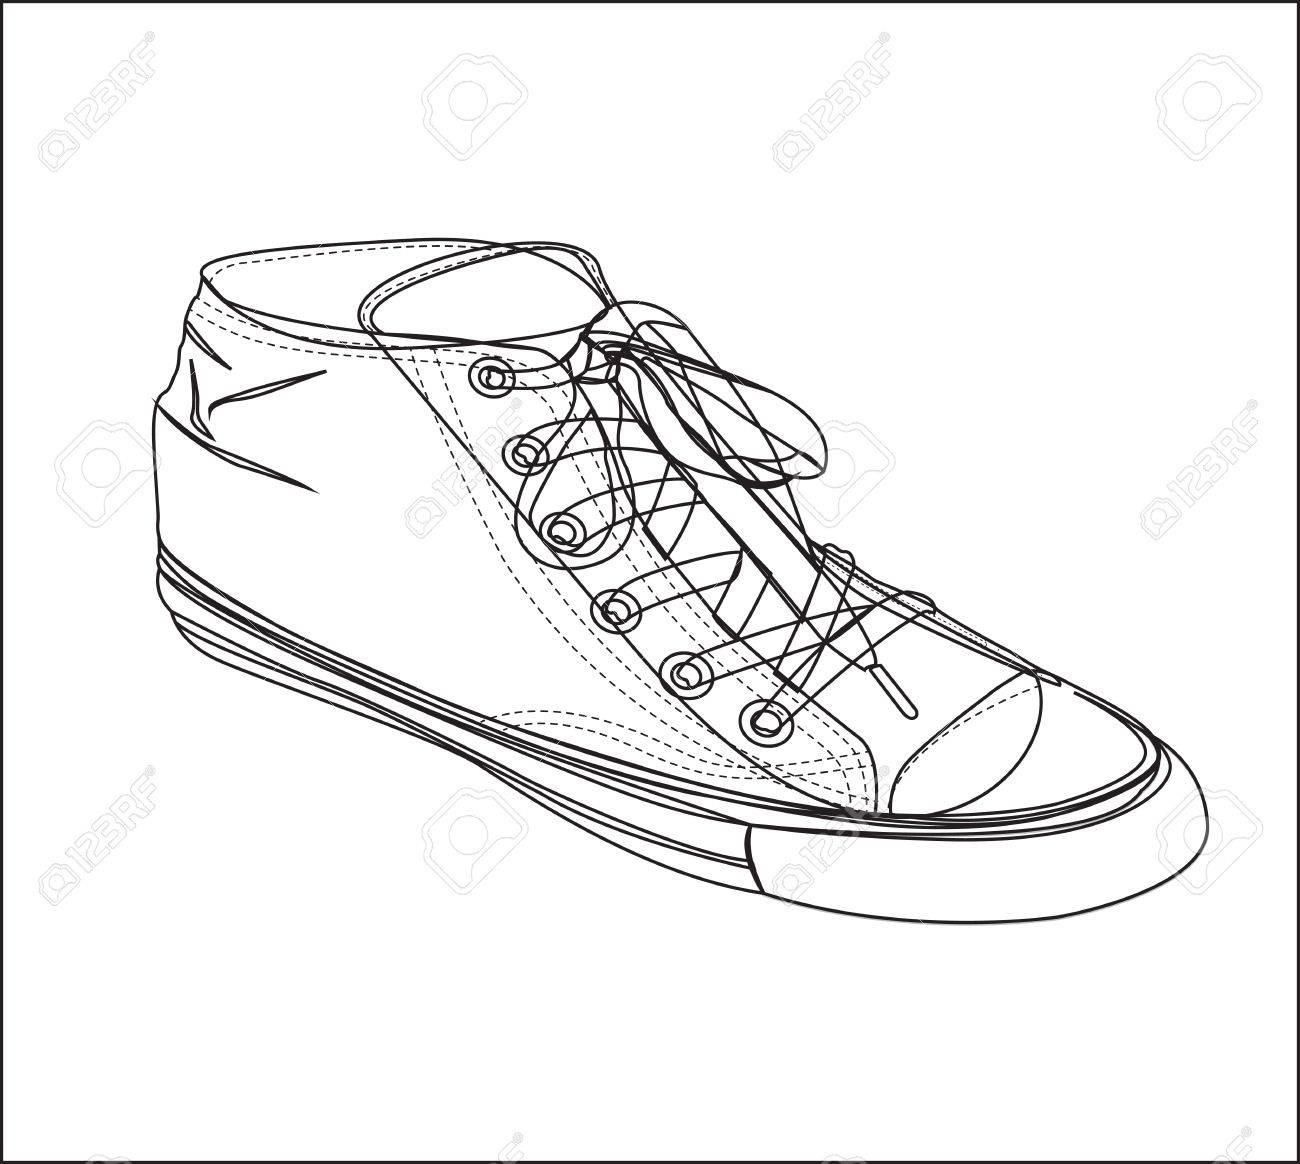 Tennis silhouette on white background, vector illustration Stock Vector - 14375047